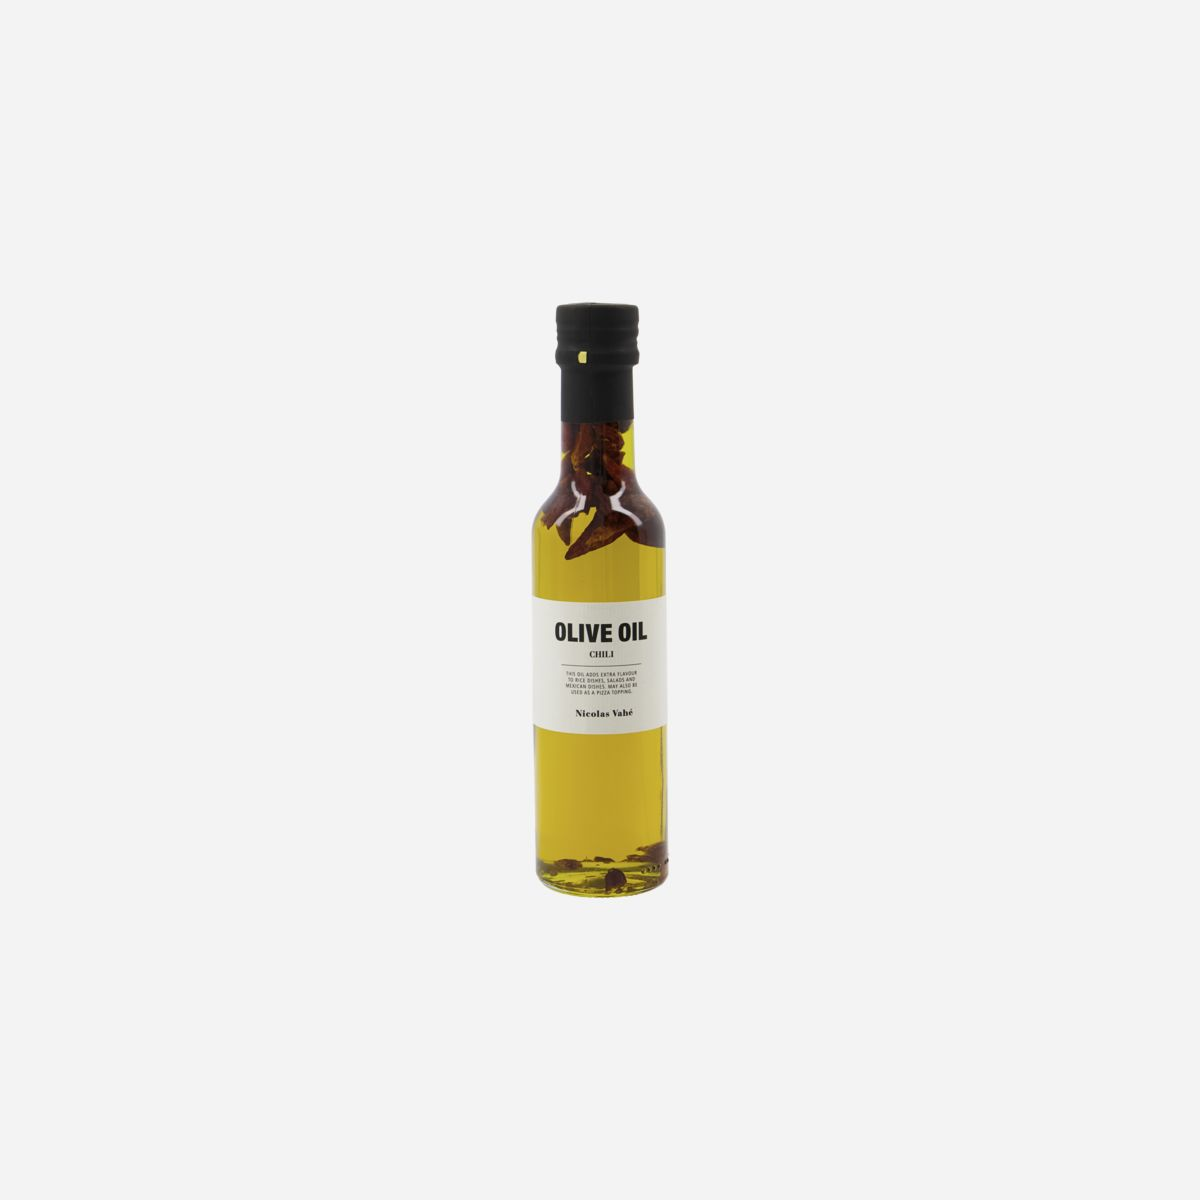 Aceite de Oliva Virgen Extra con Chilli - Nicolas Vahe - Liderlamp (1)